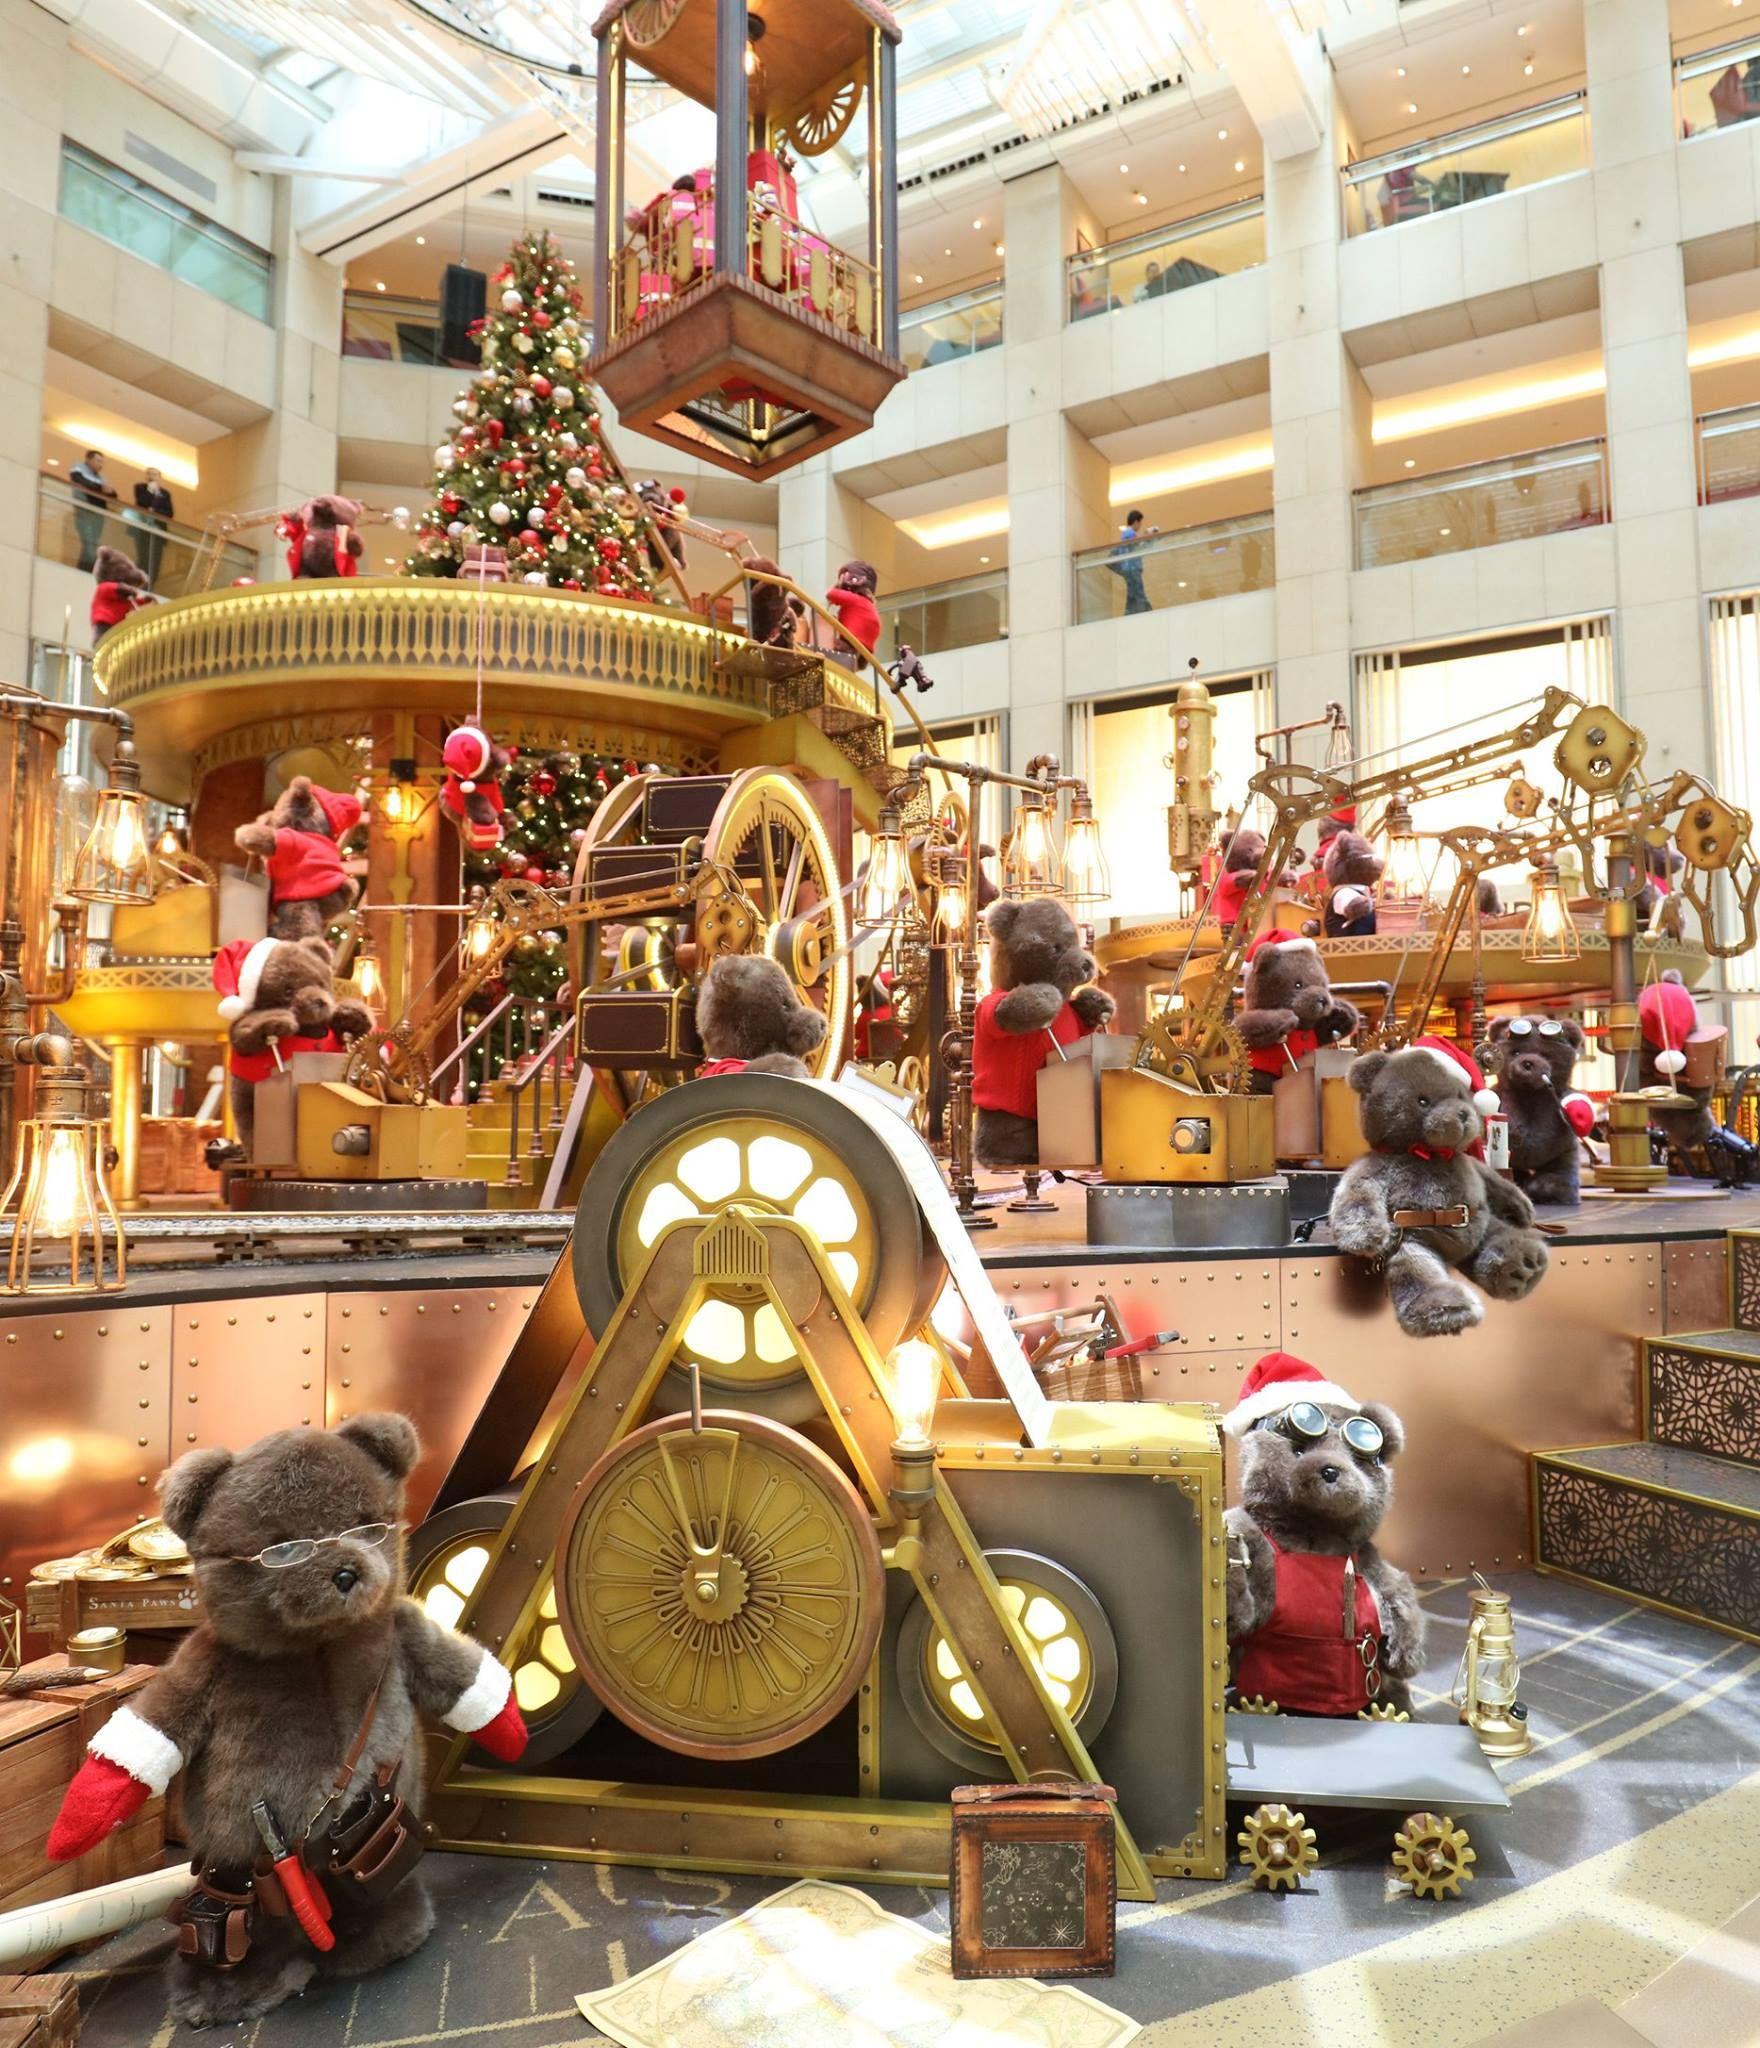 Christmas 2017, Christmas Trees, Christmas Decor, Christmas Displays, Xmas Decorations,